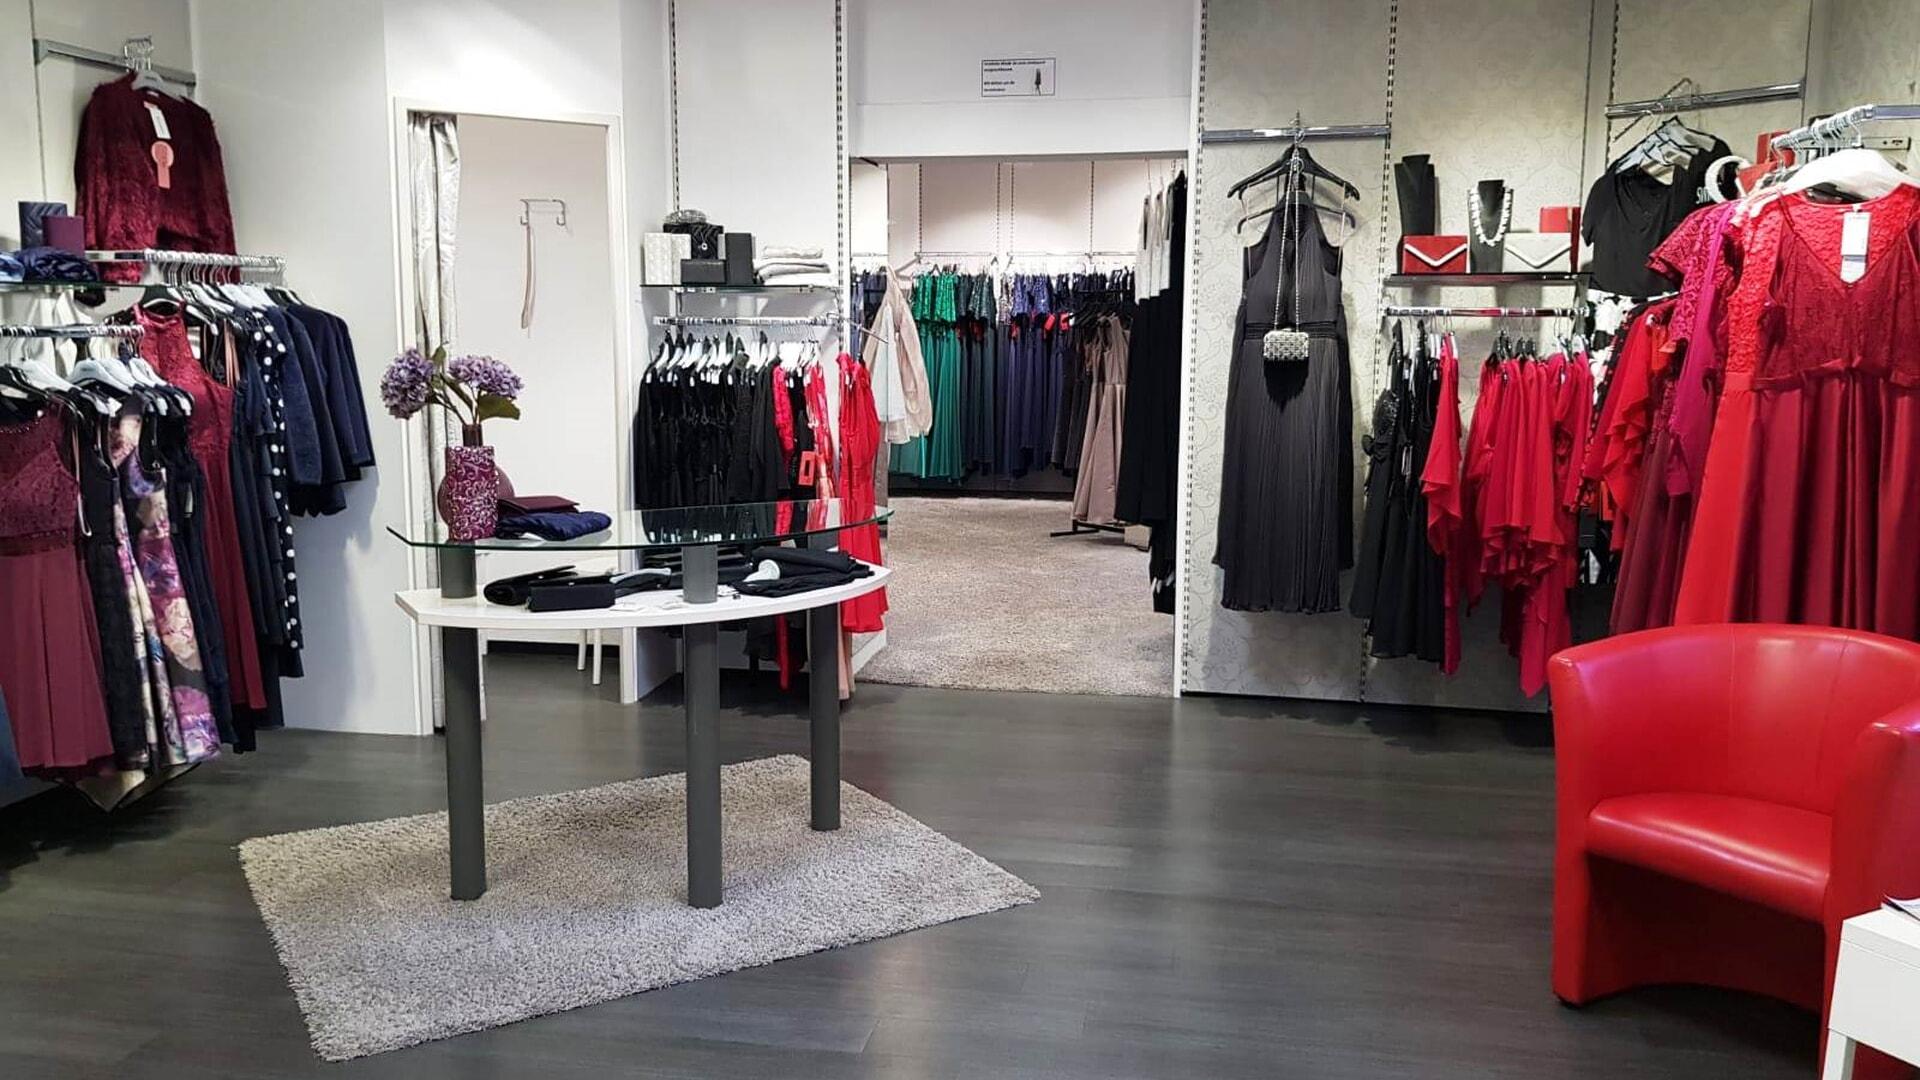 Rudel Kleidung GmbH